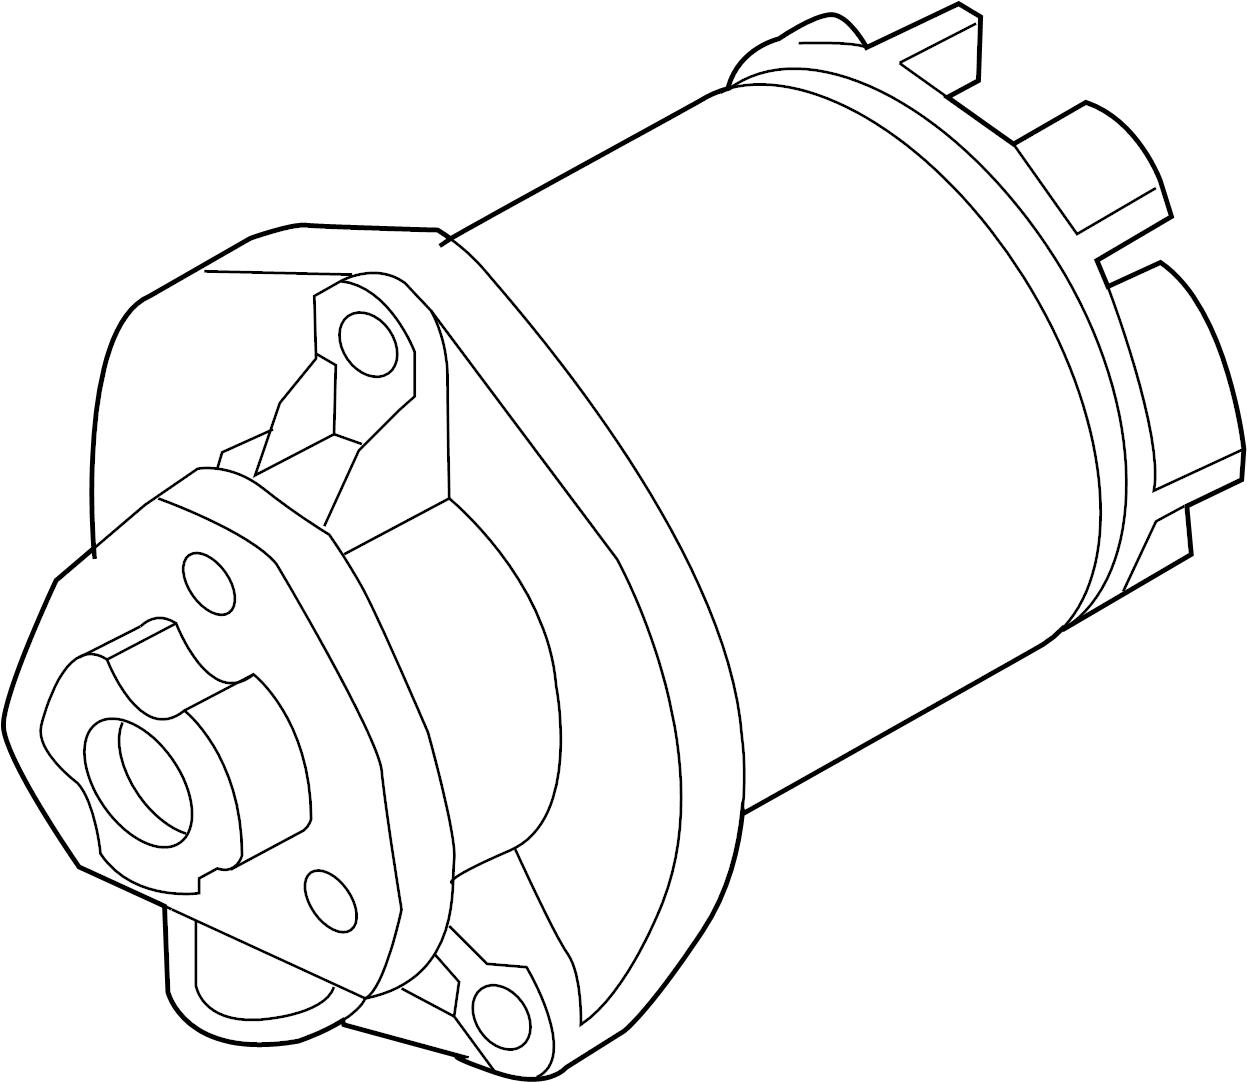 1600cc vw engine diagram additionally volkswagen eurovan engine html in addition volkswagen eurovan engine html moreover